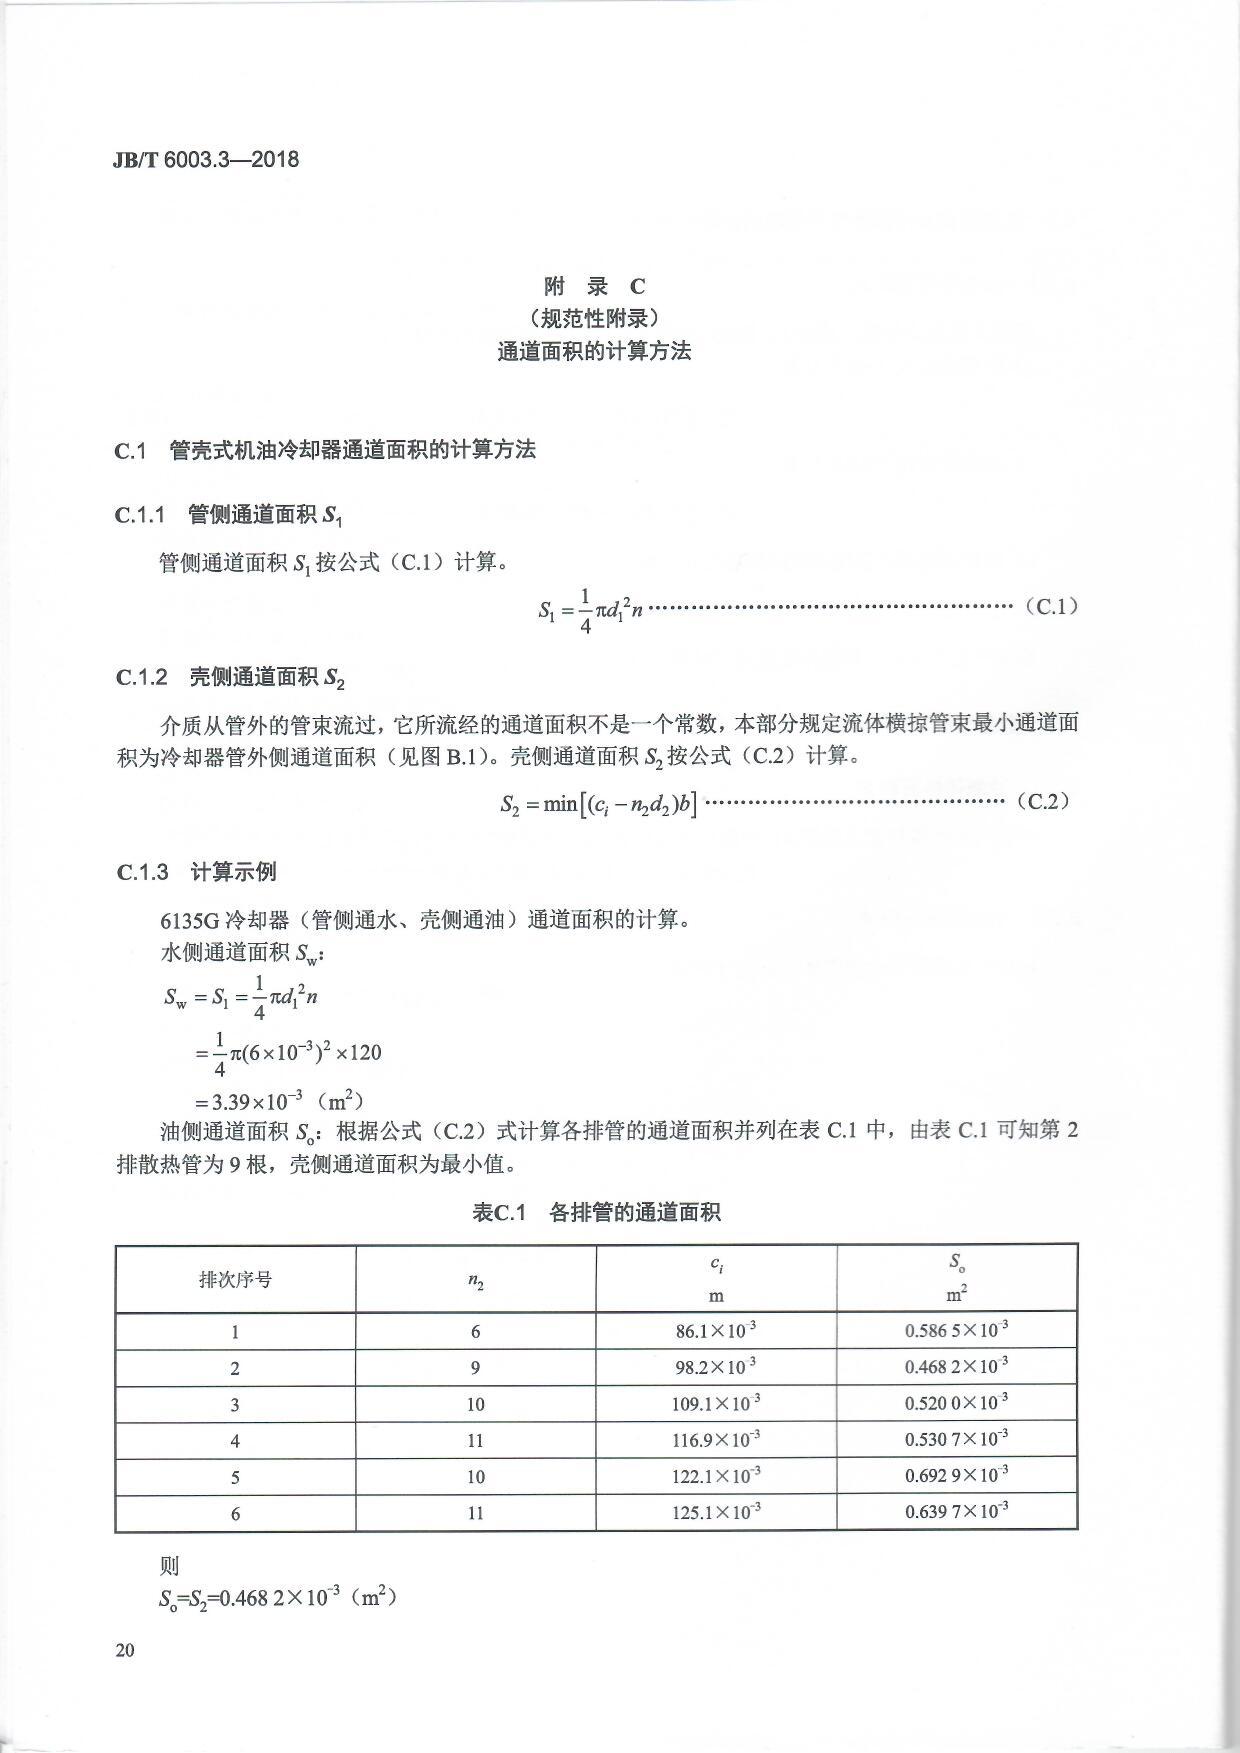 5df6db2ac2c97.jpg